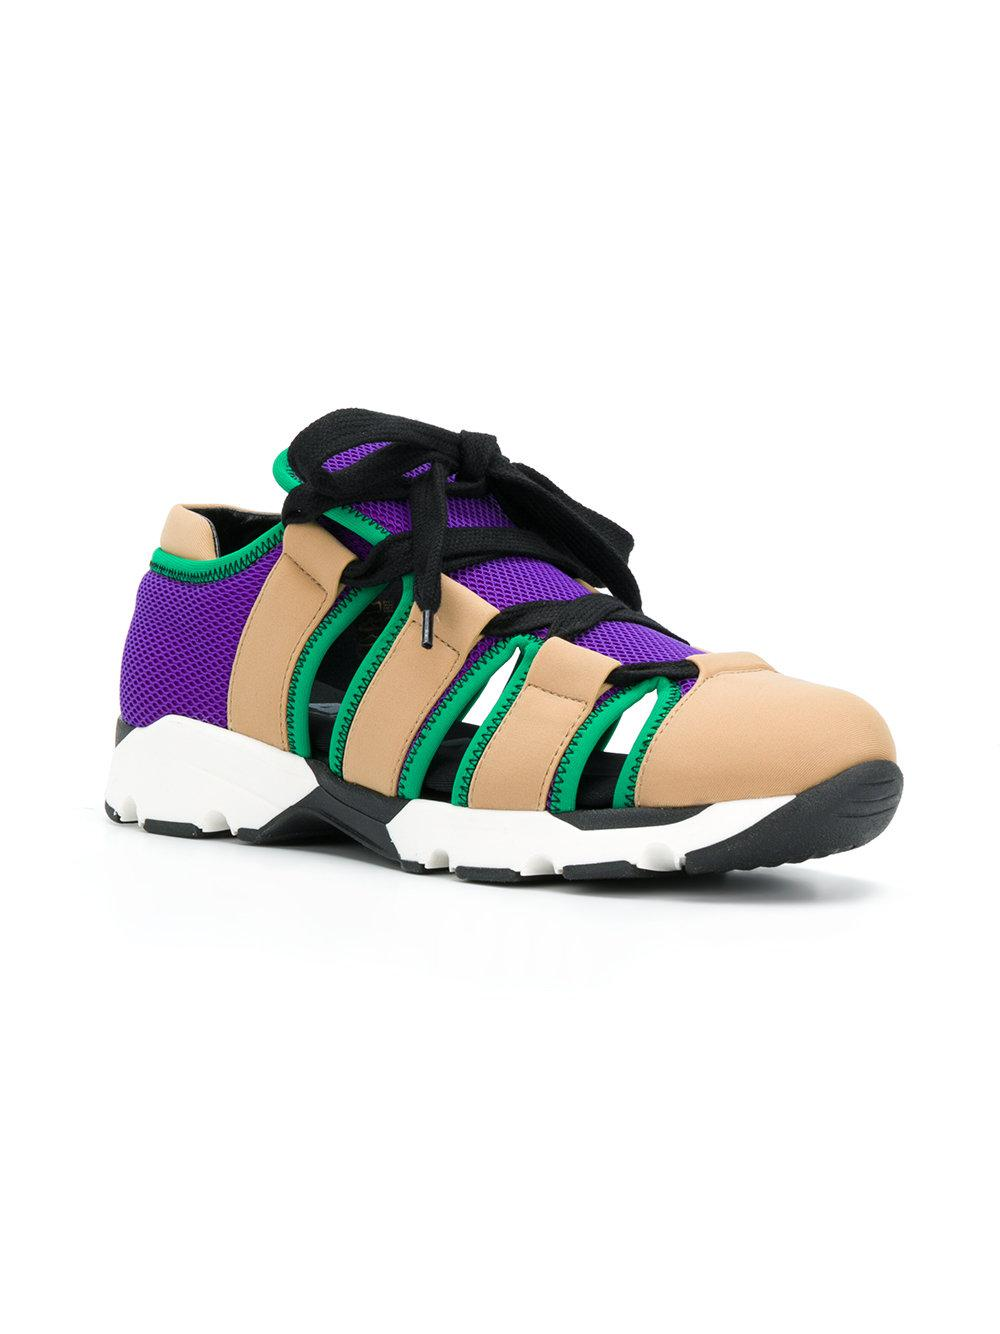 Chaussures De Sport Techno Marni - Polychromes Zc73koue